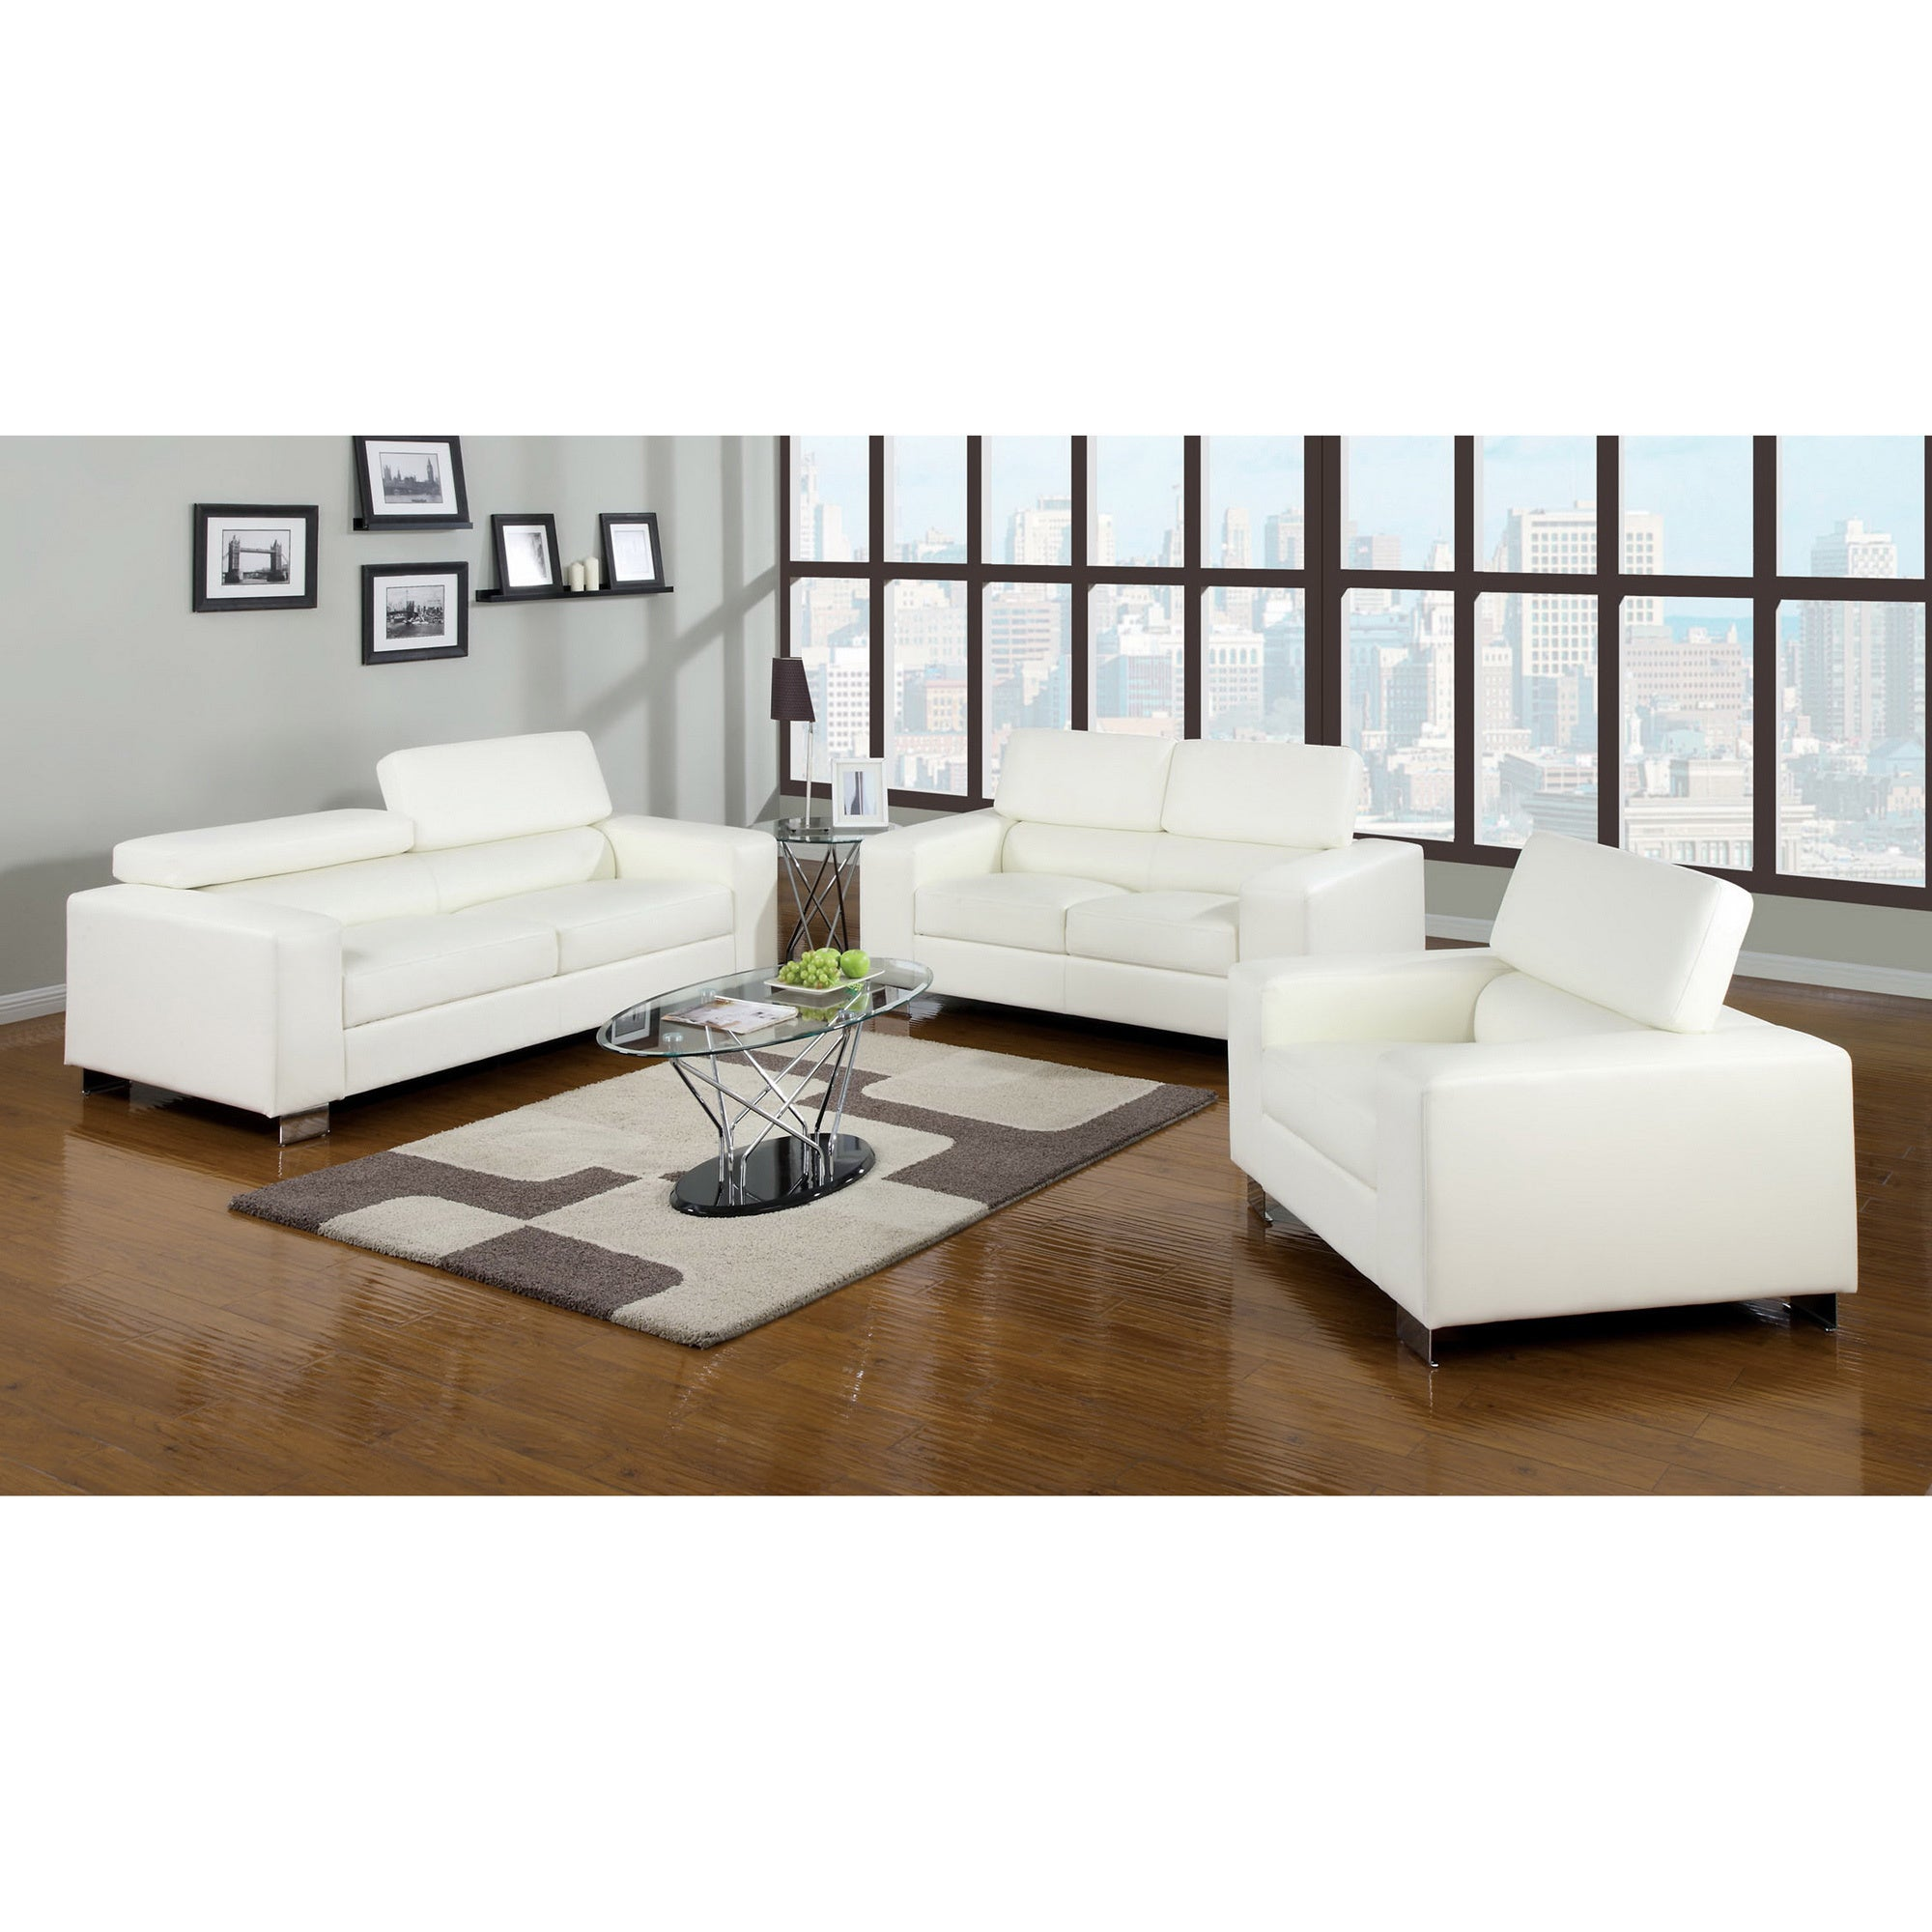 Furniture of America Mazri 3-piece Bonded Leather Sofa Set - Free ...